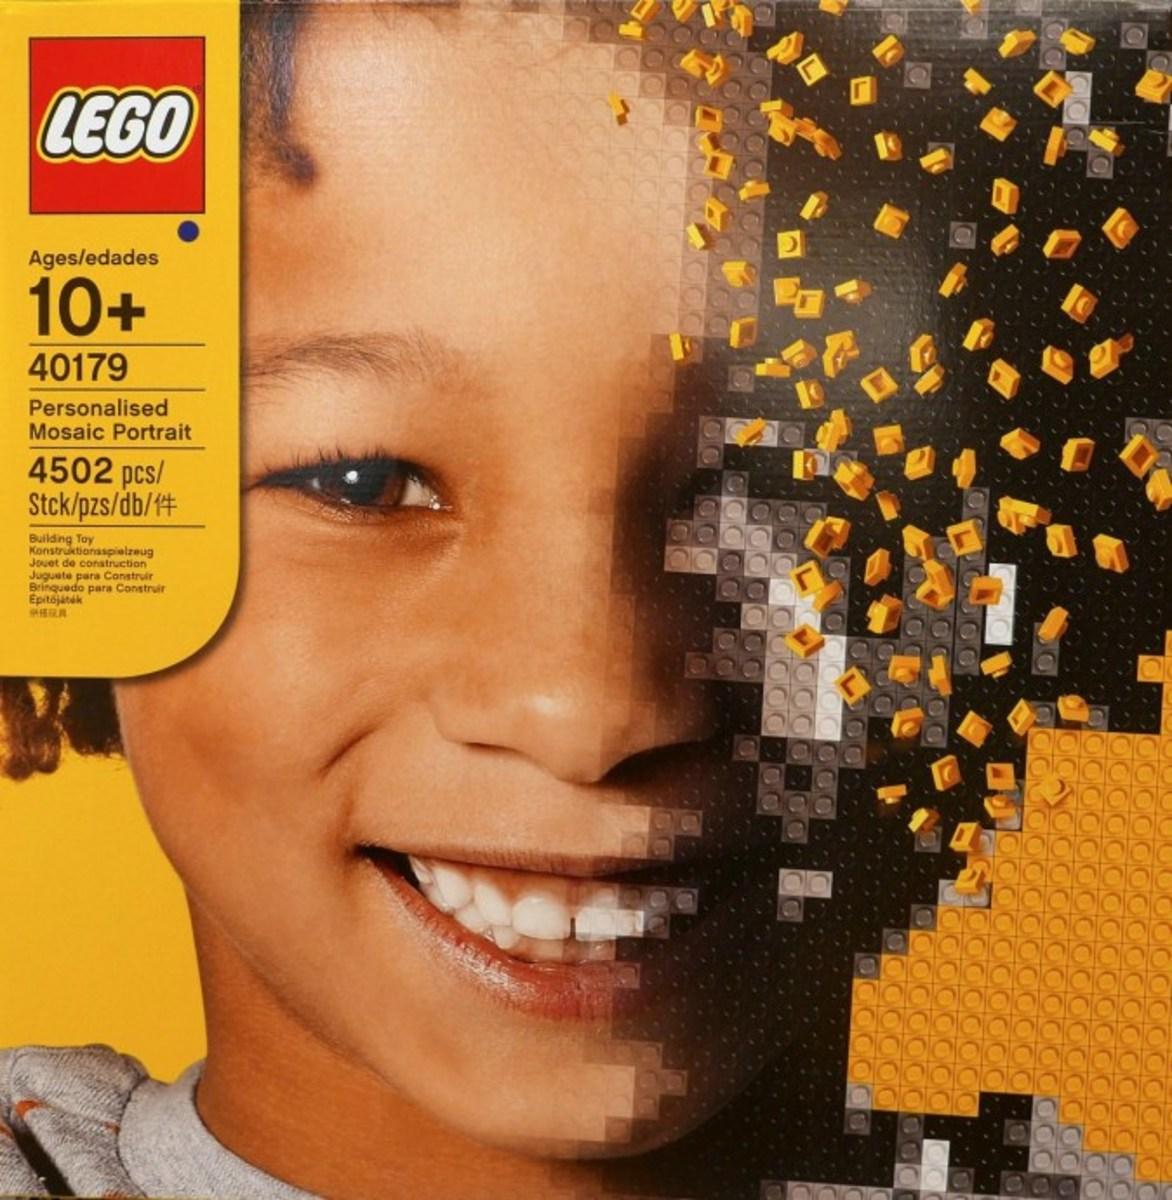 LEGO Personalized Mosaic Portrait